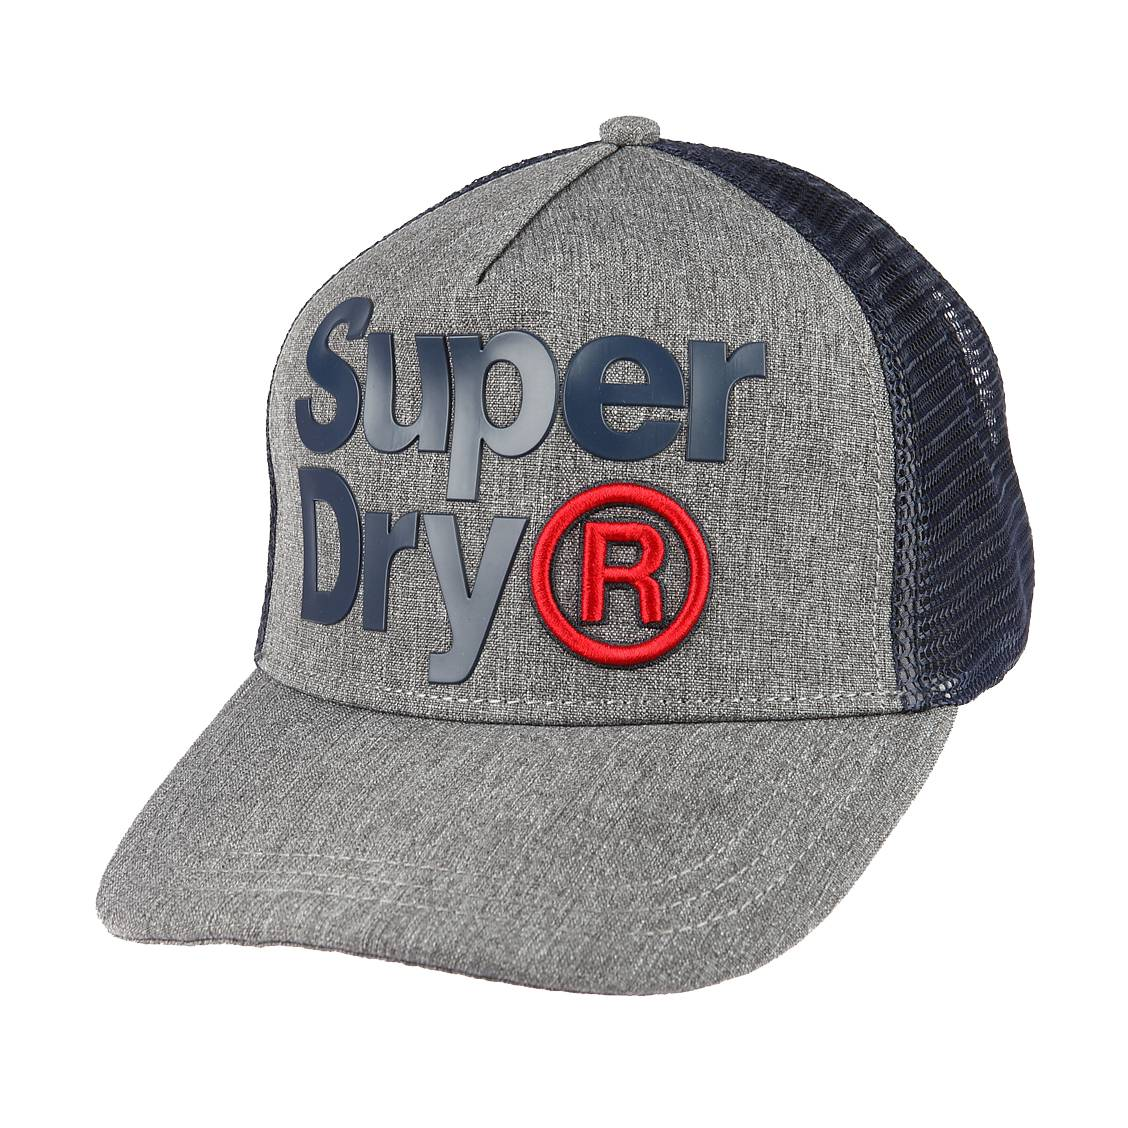 casquette superdry lineman trucker gris chin et bleu marine rue des hommes. Black Bedroom Furniture Sets. Home Design Ideas